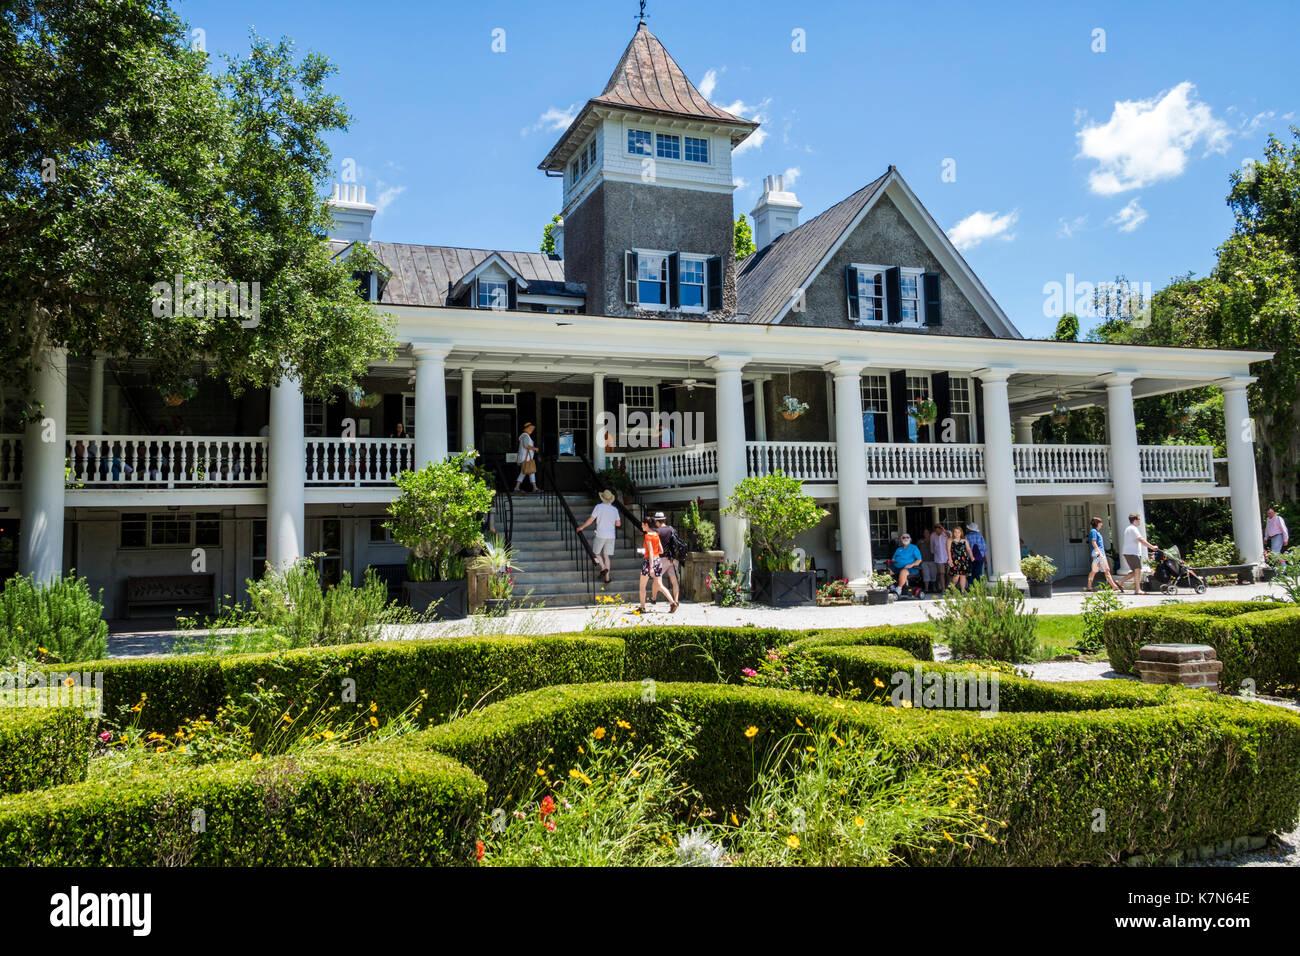 Charleston South Carolina SC Magnolia Plantation and Gardens Antebellum house museum - Stock Image